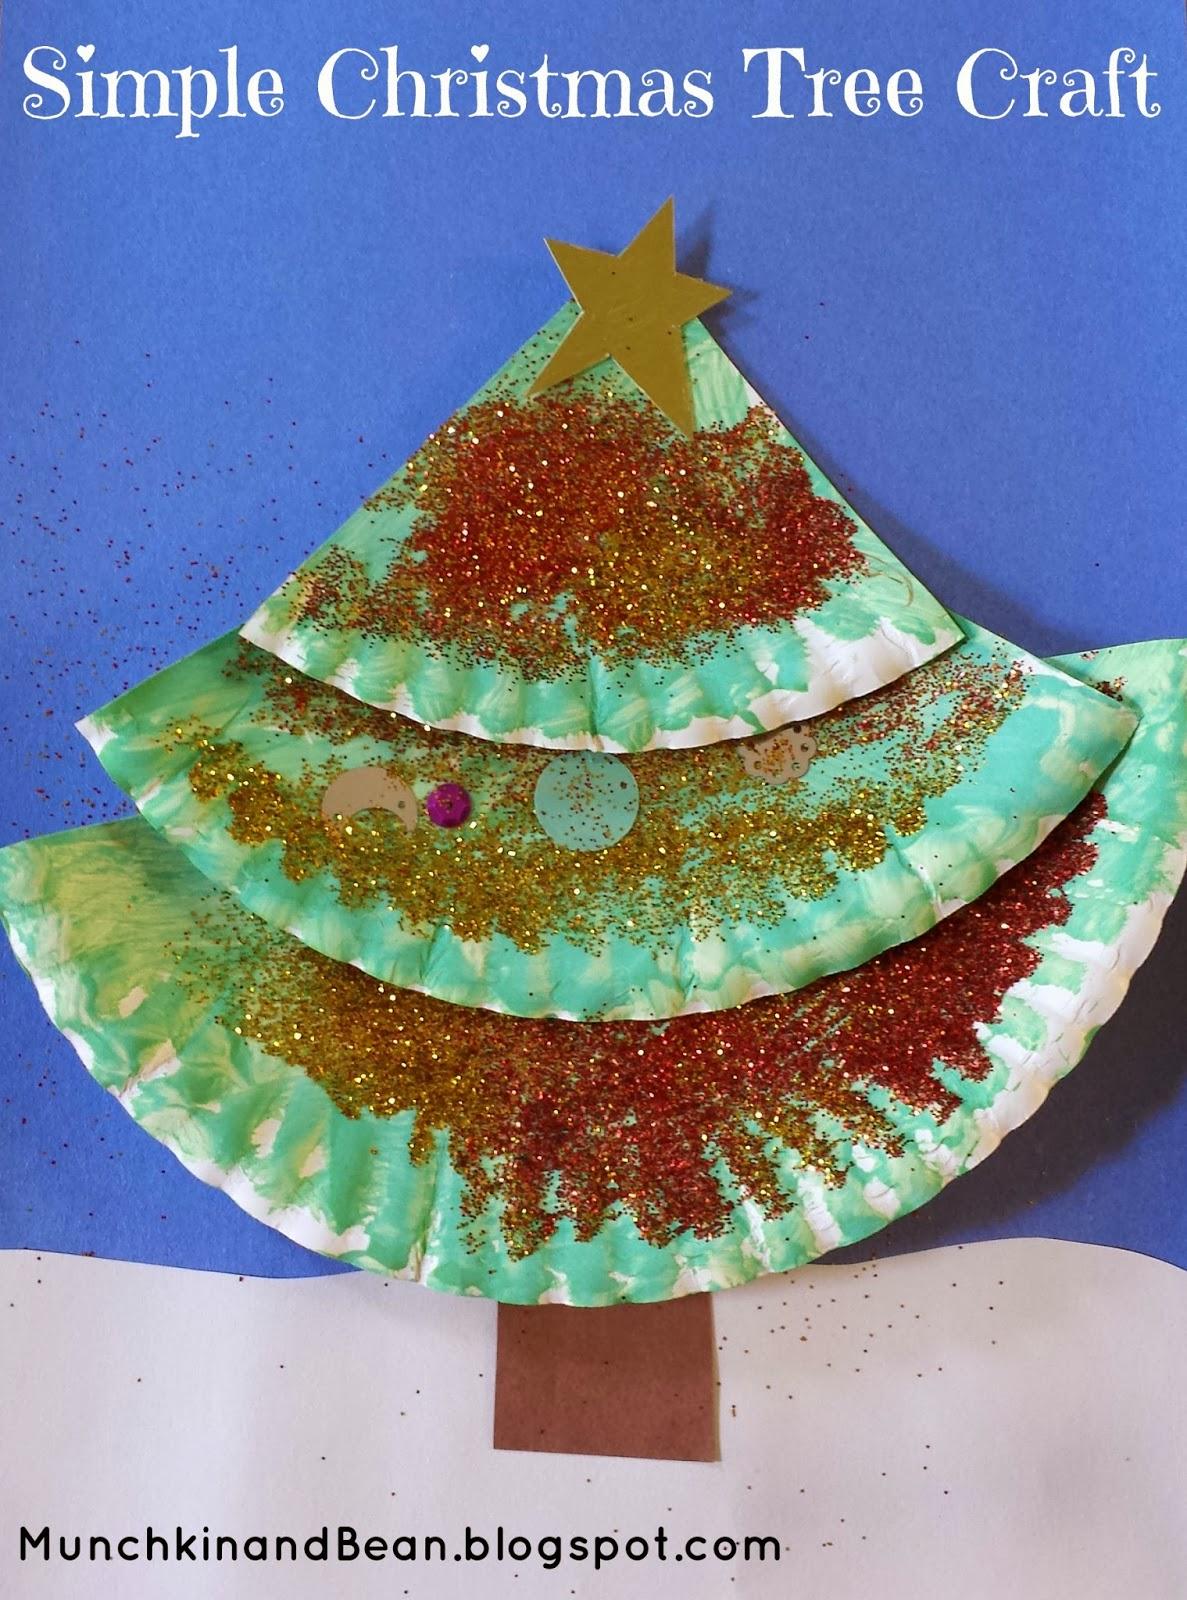 Simple Christmas Tree Craft